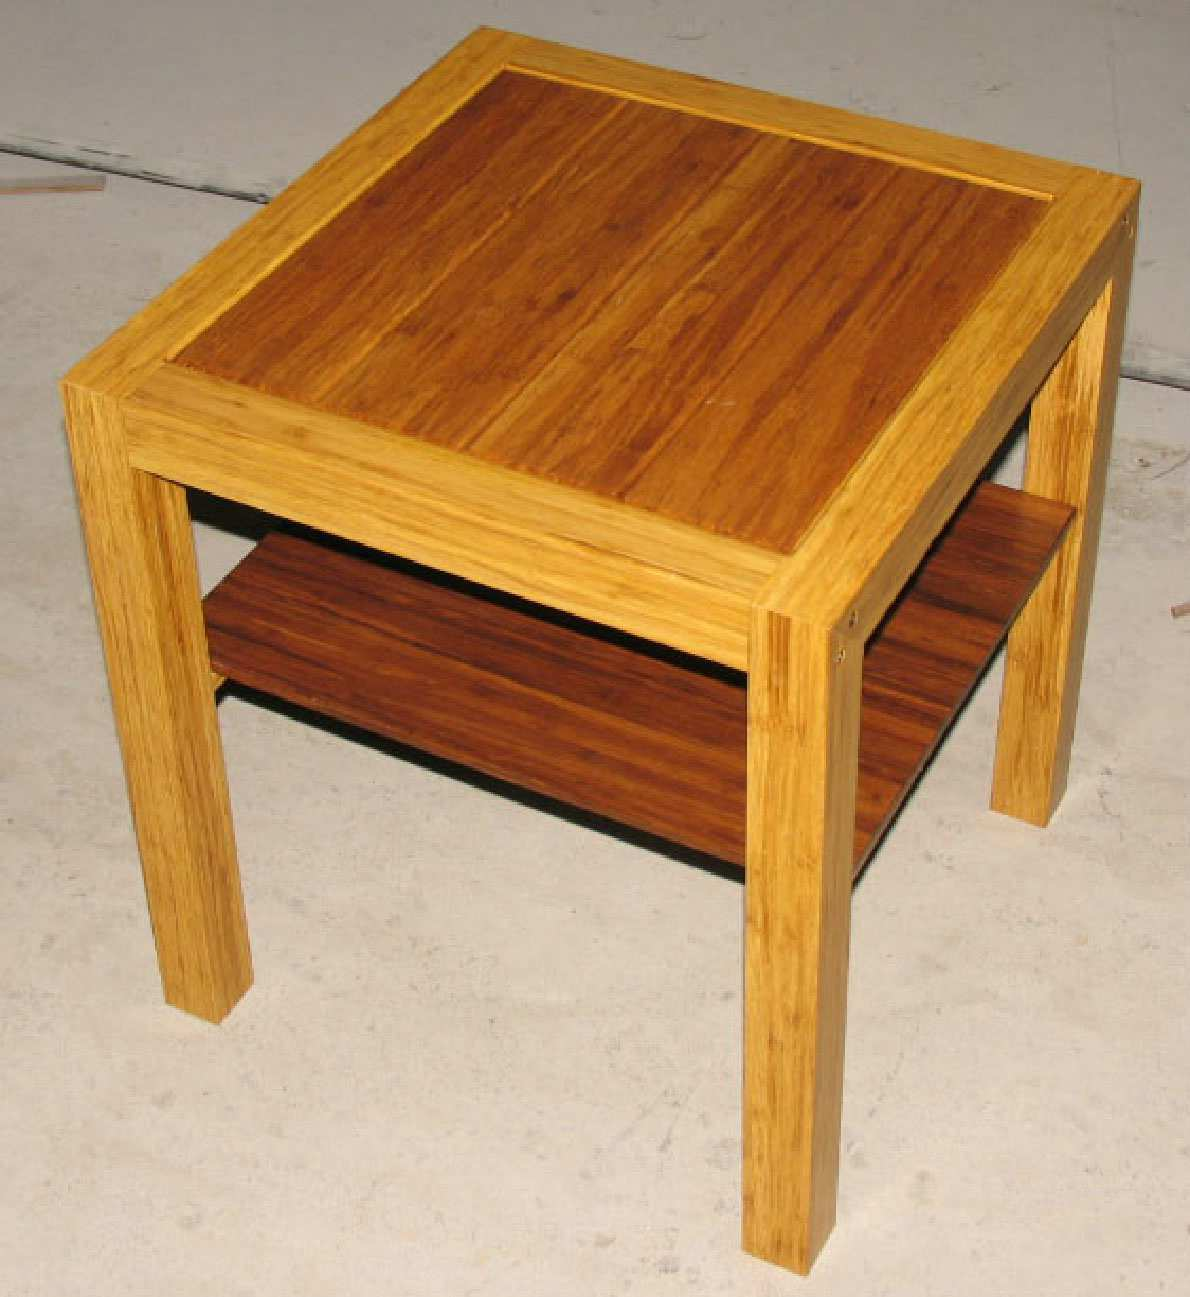 furniture accessories hardware furniture and decor for your home furniture accessories hardware west elm modern furniture home decor home accessories bamboo furniture yl02 bamboo